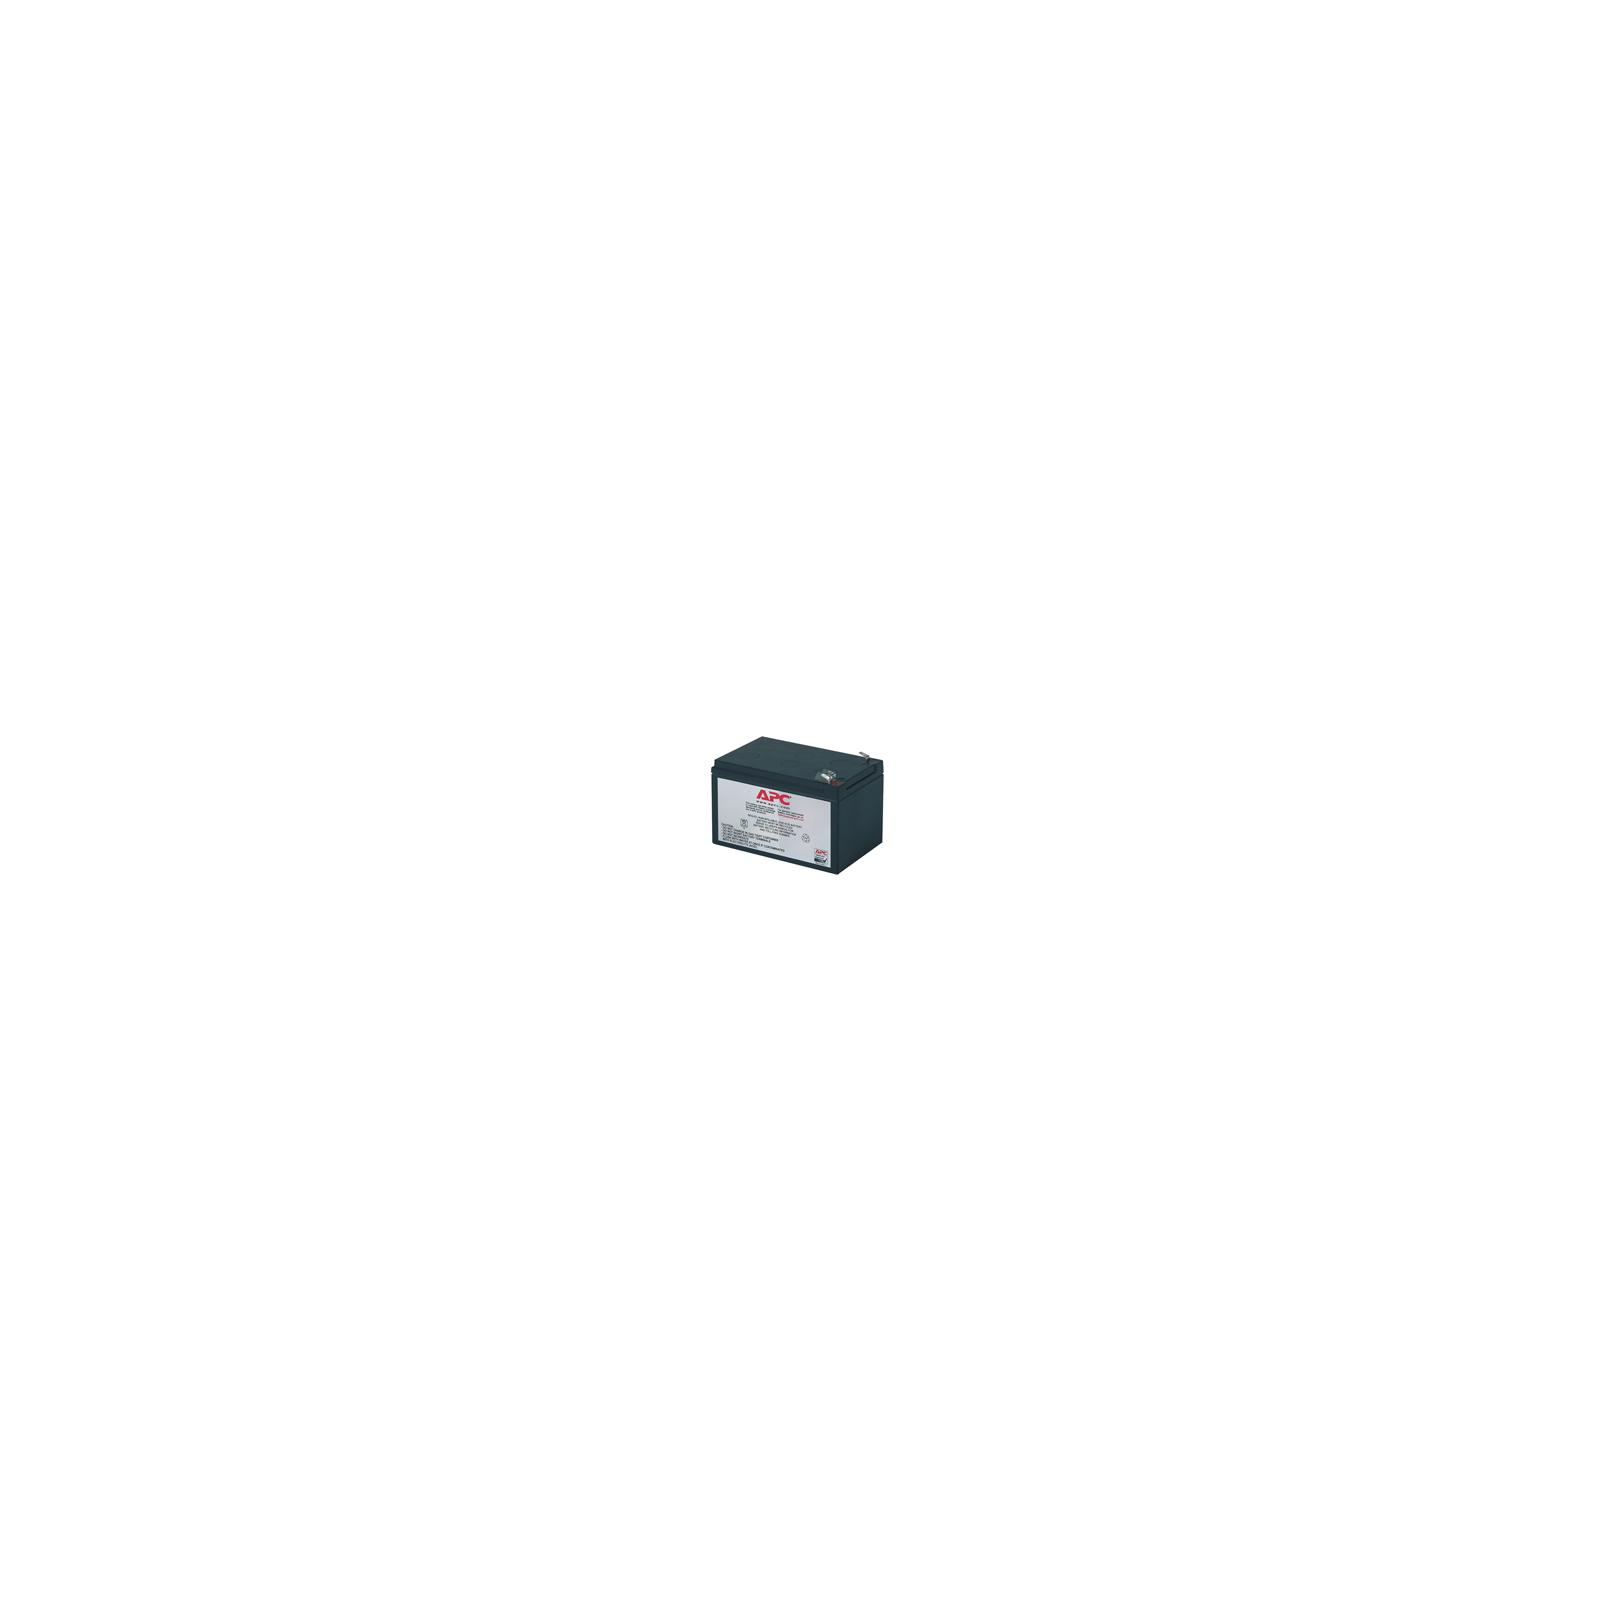 Батарея к ИБП Replacement Battery Cartridge #4 APC (RBC4)